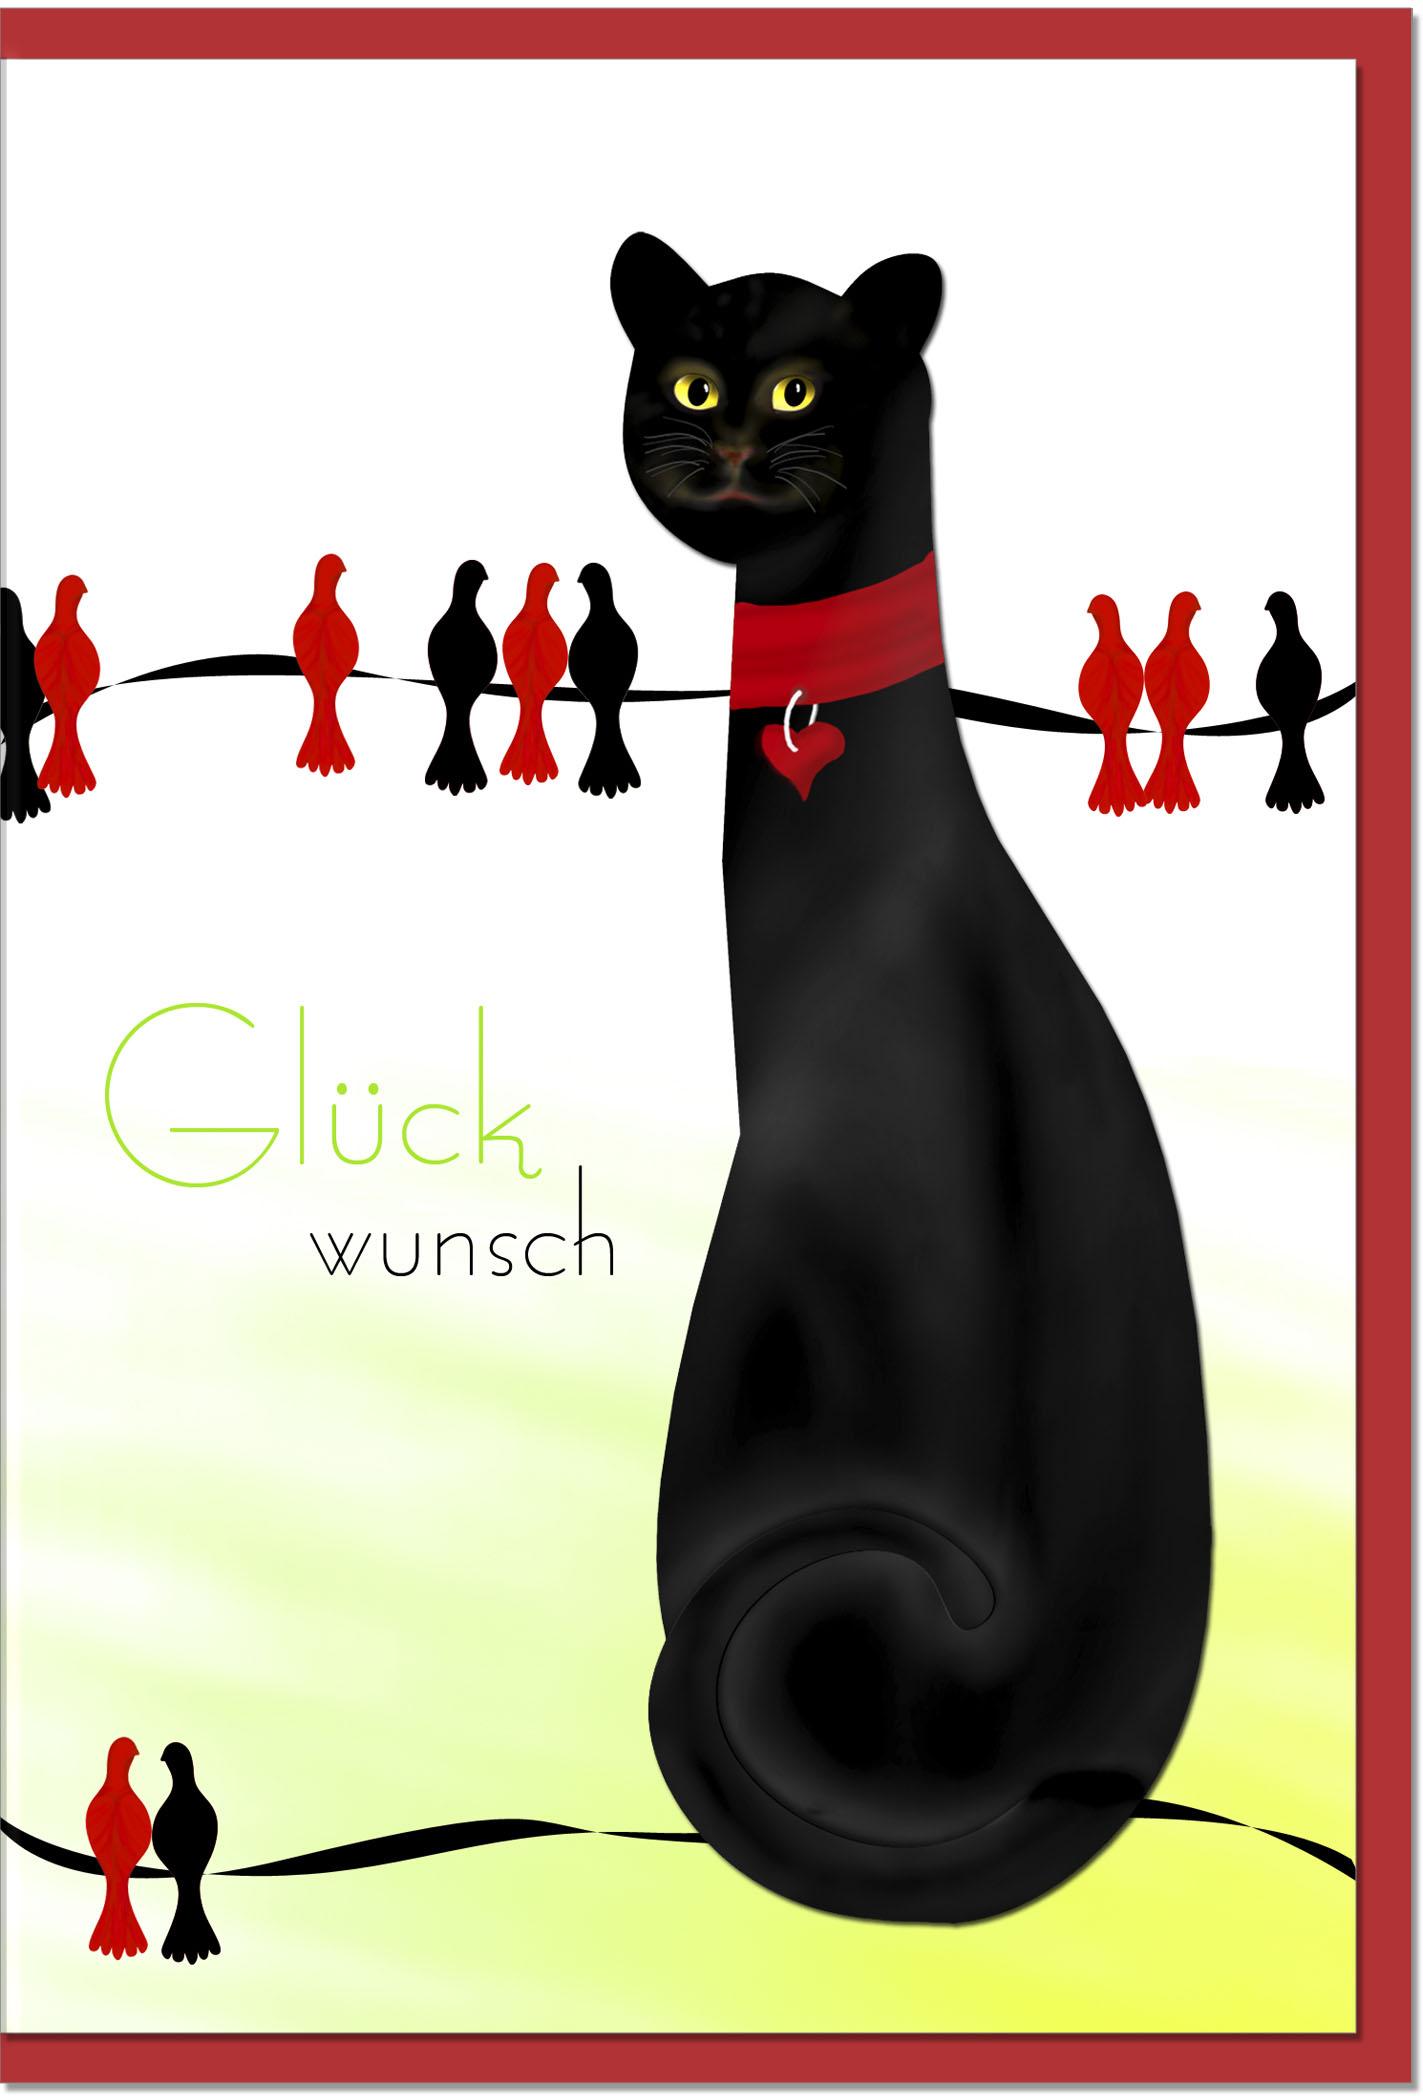 Glückwunschkarten / Grußkarten /Glückwunsch Katze